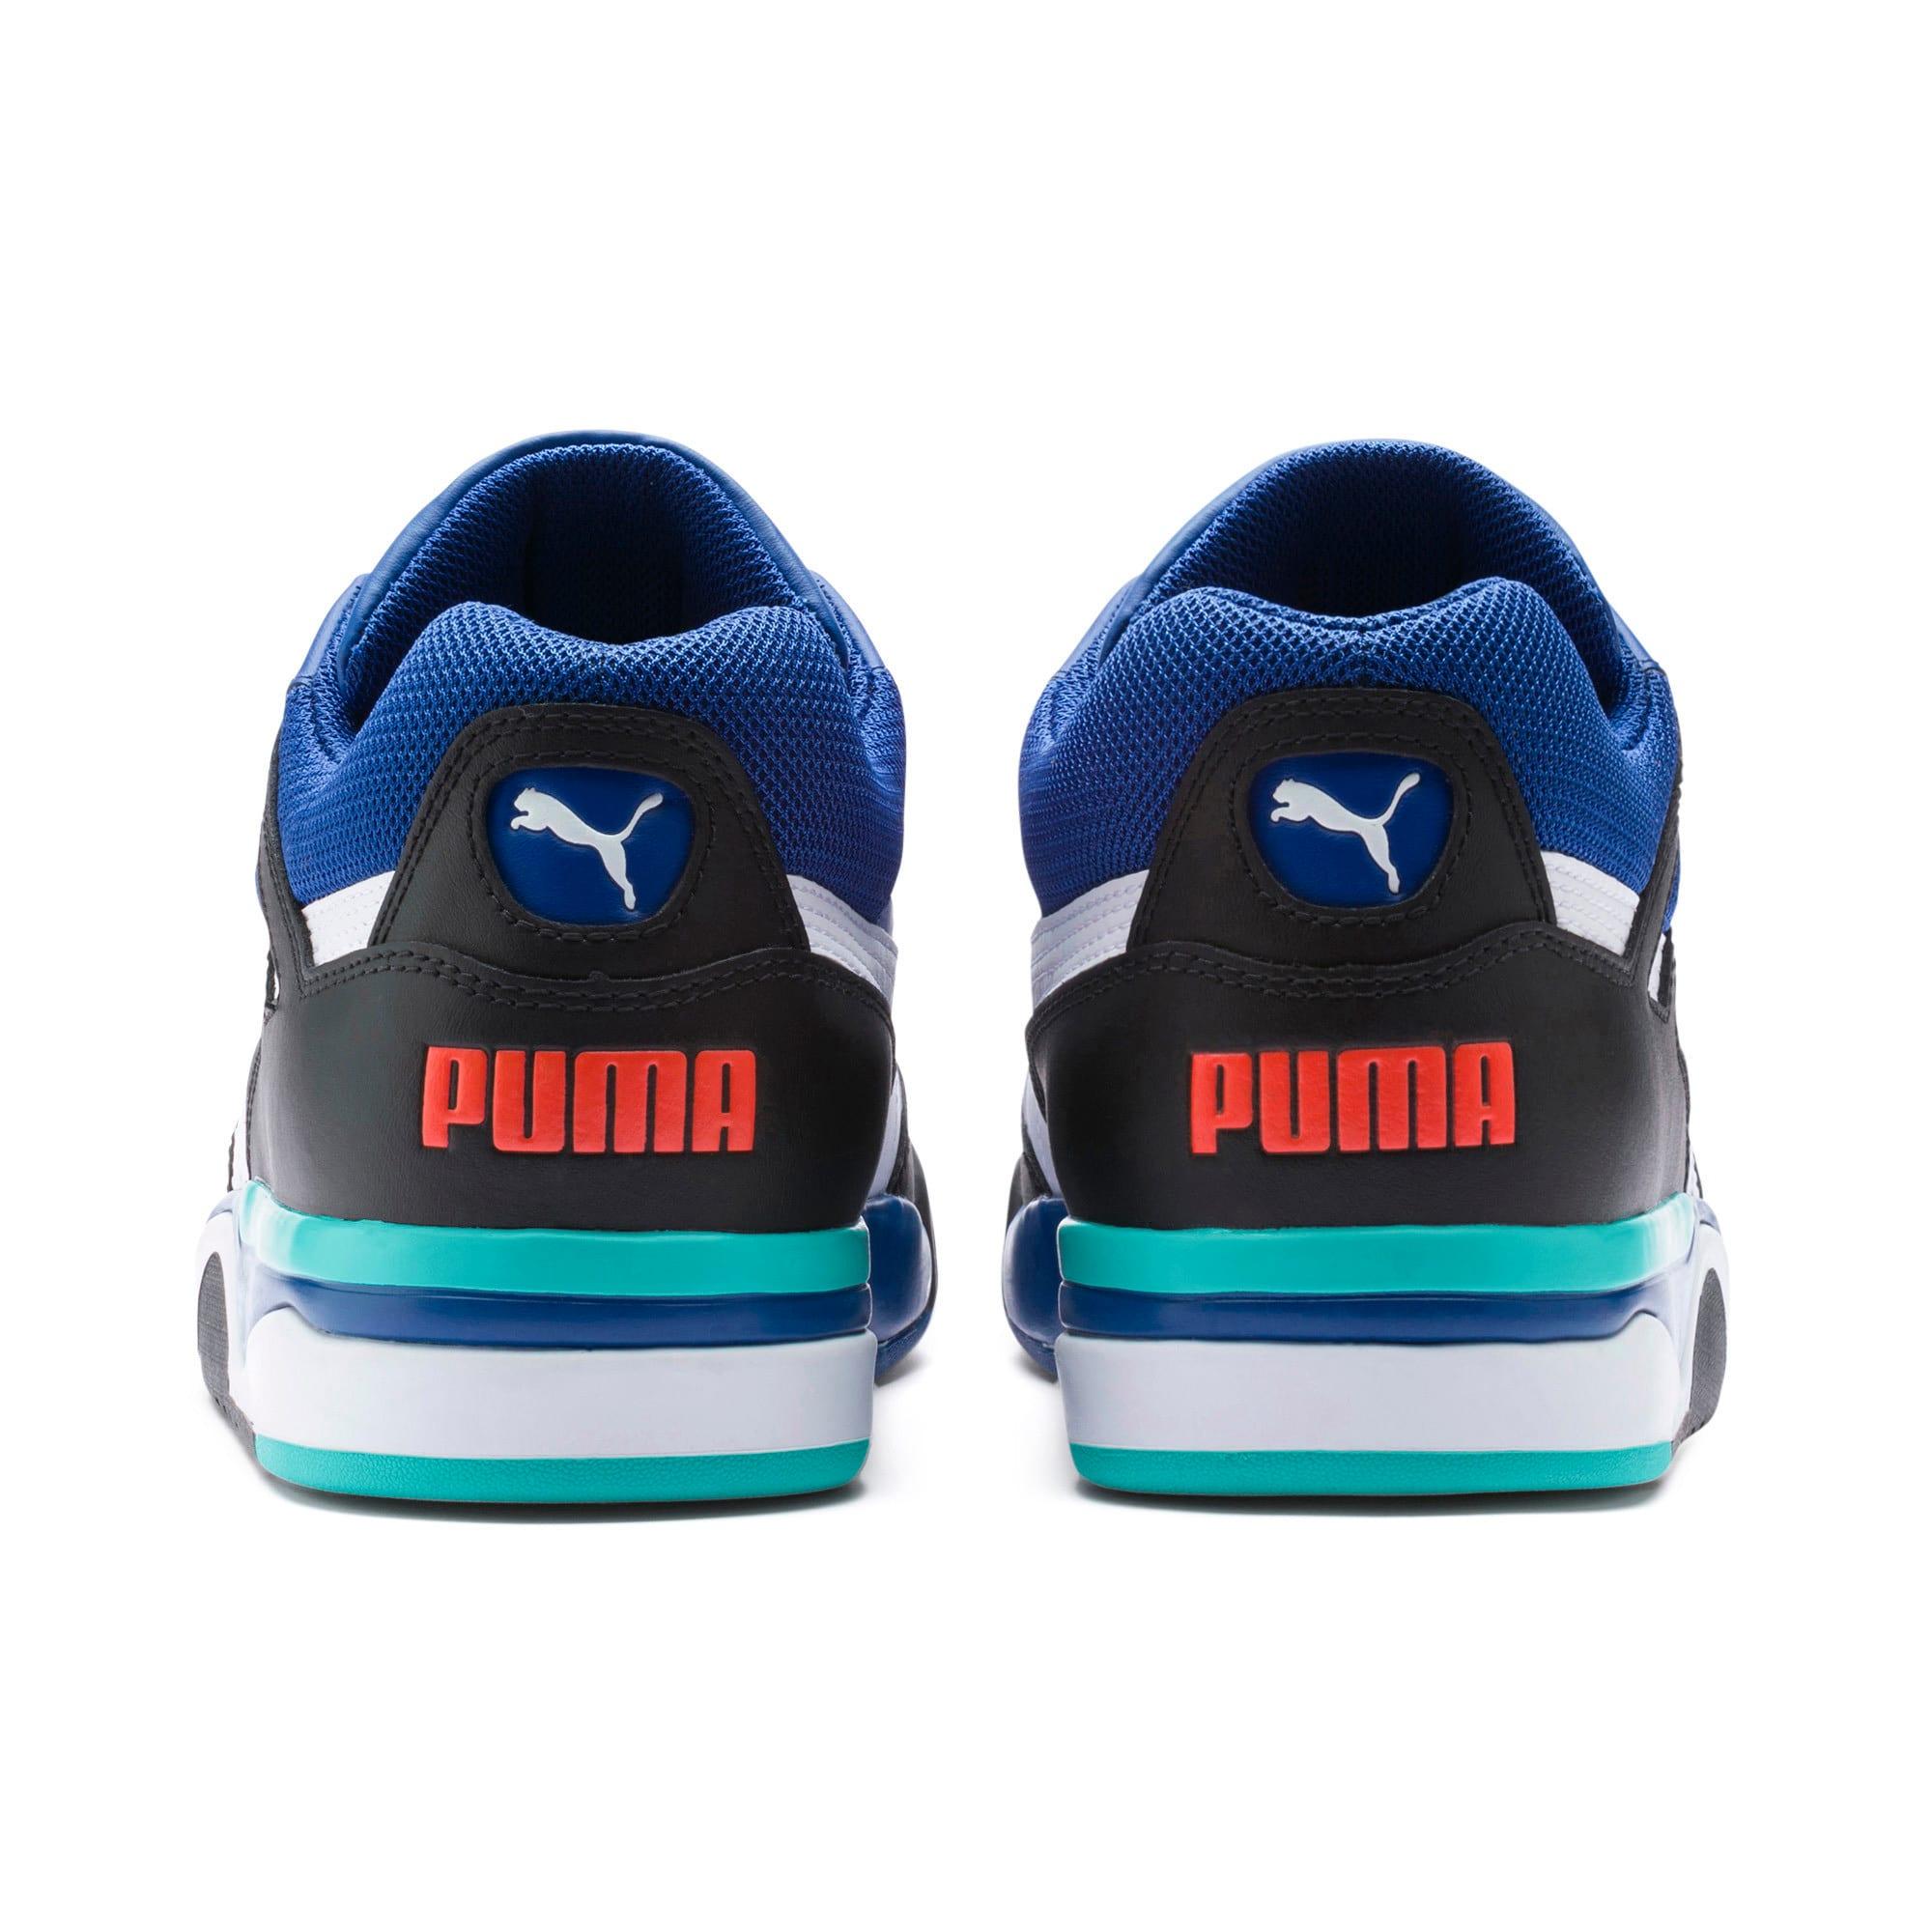 Thumbnail 3 of Palace Guard Sneakers, Puma Black-Puma White-Blue, medium